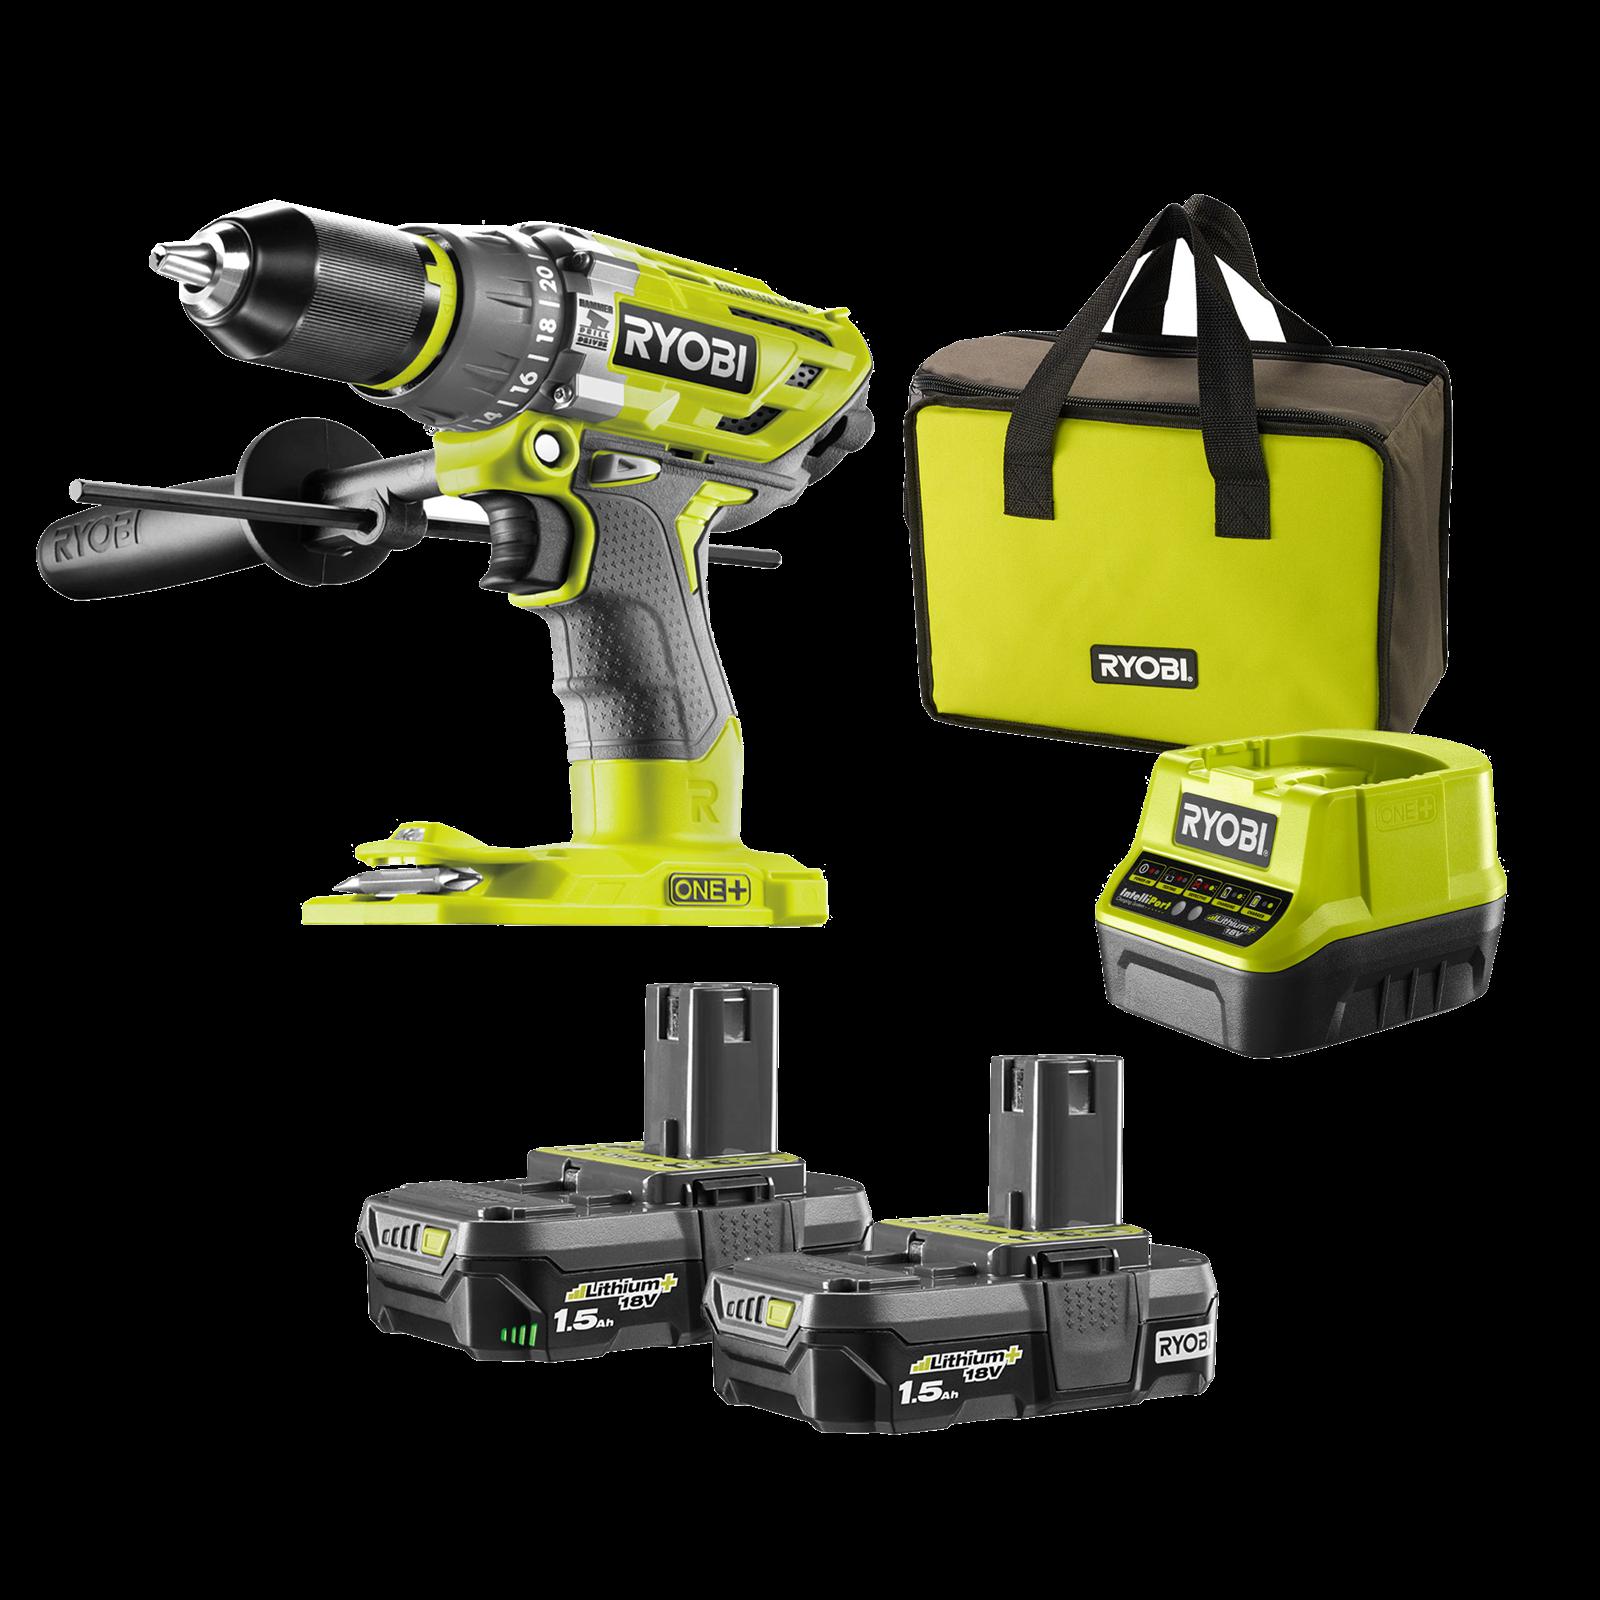 Ryobi One+ 18V Brushless Hammer Drill Kit